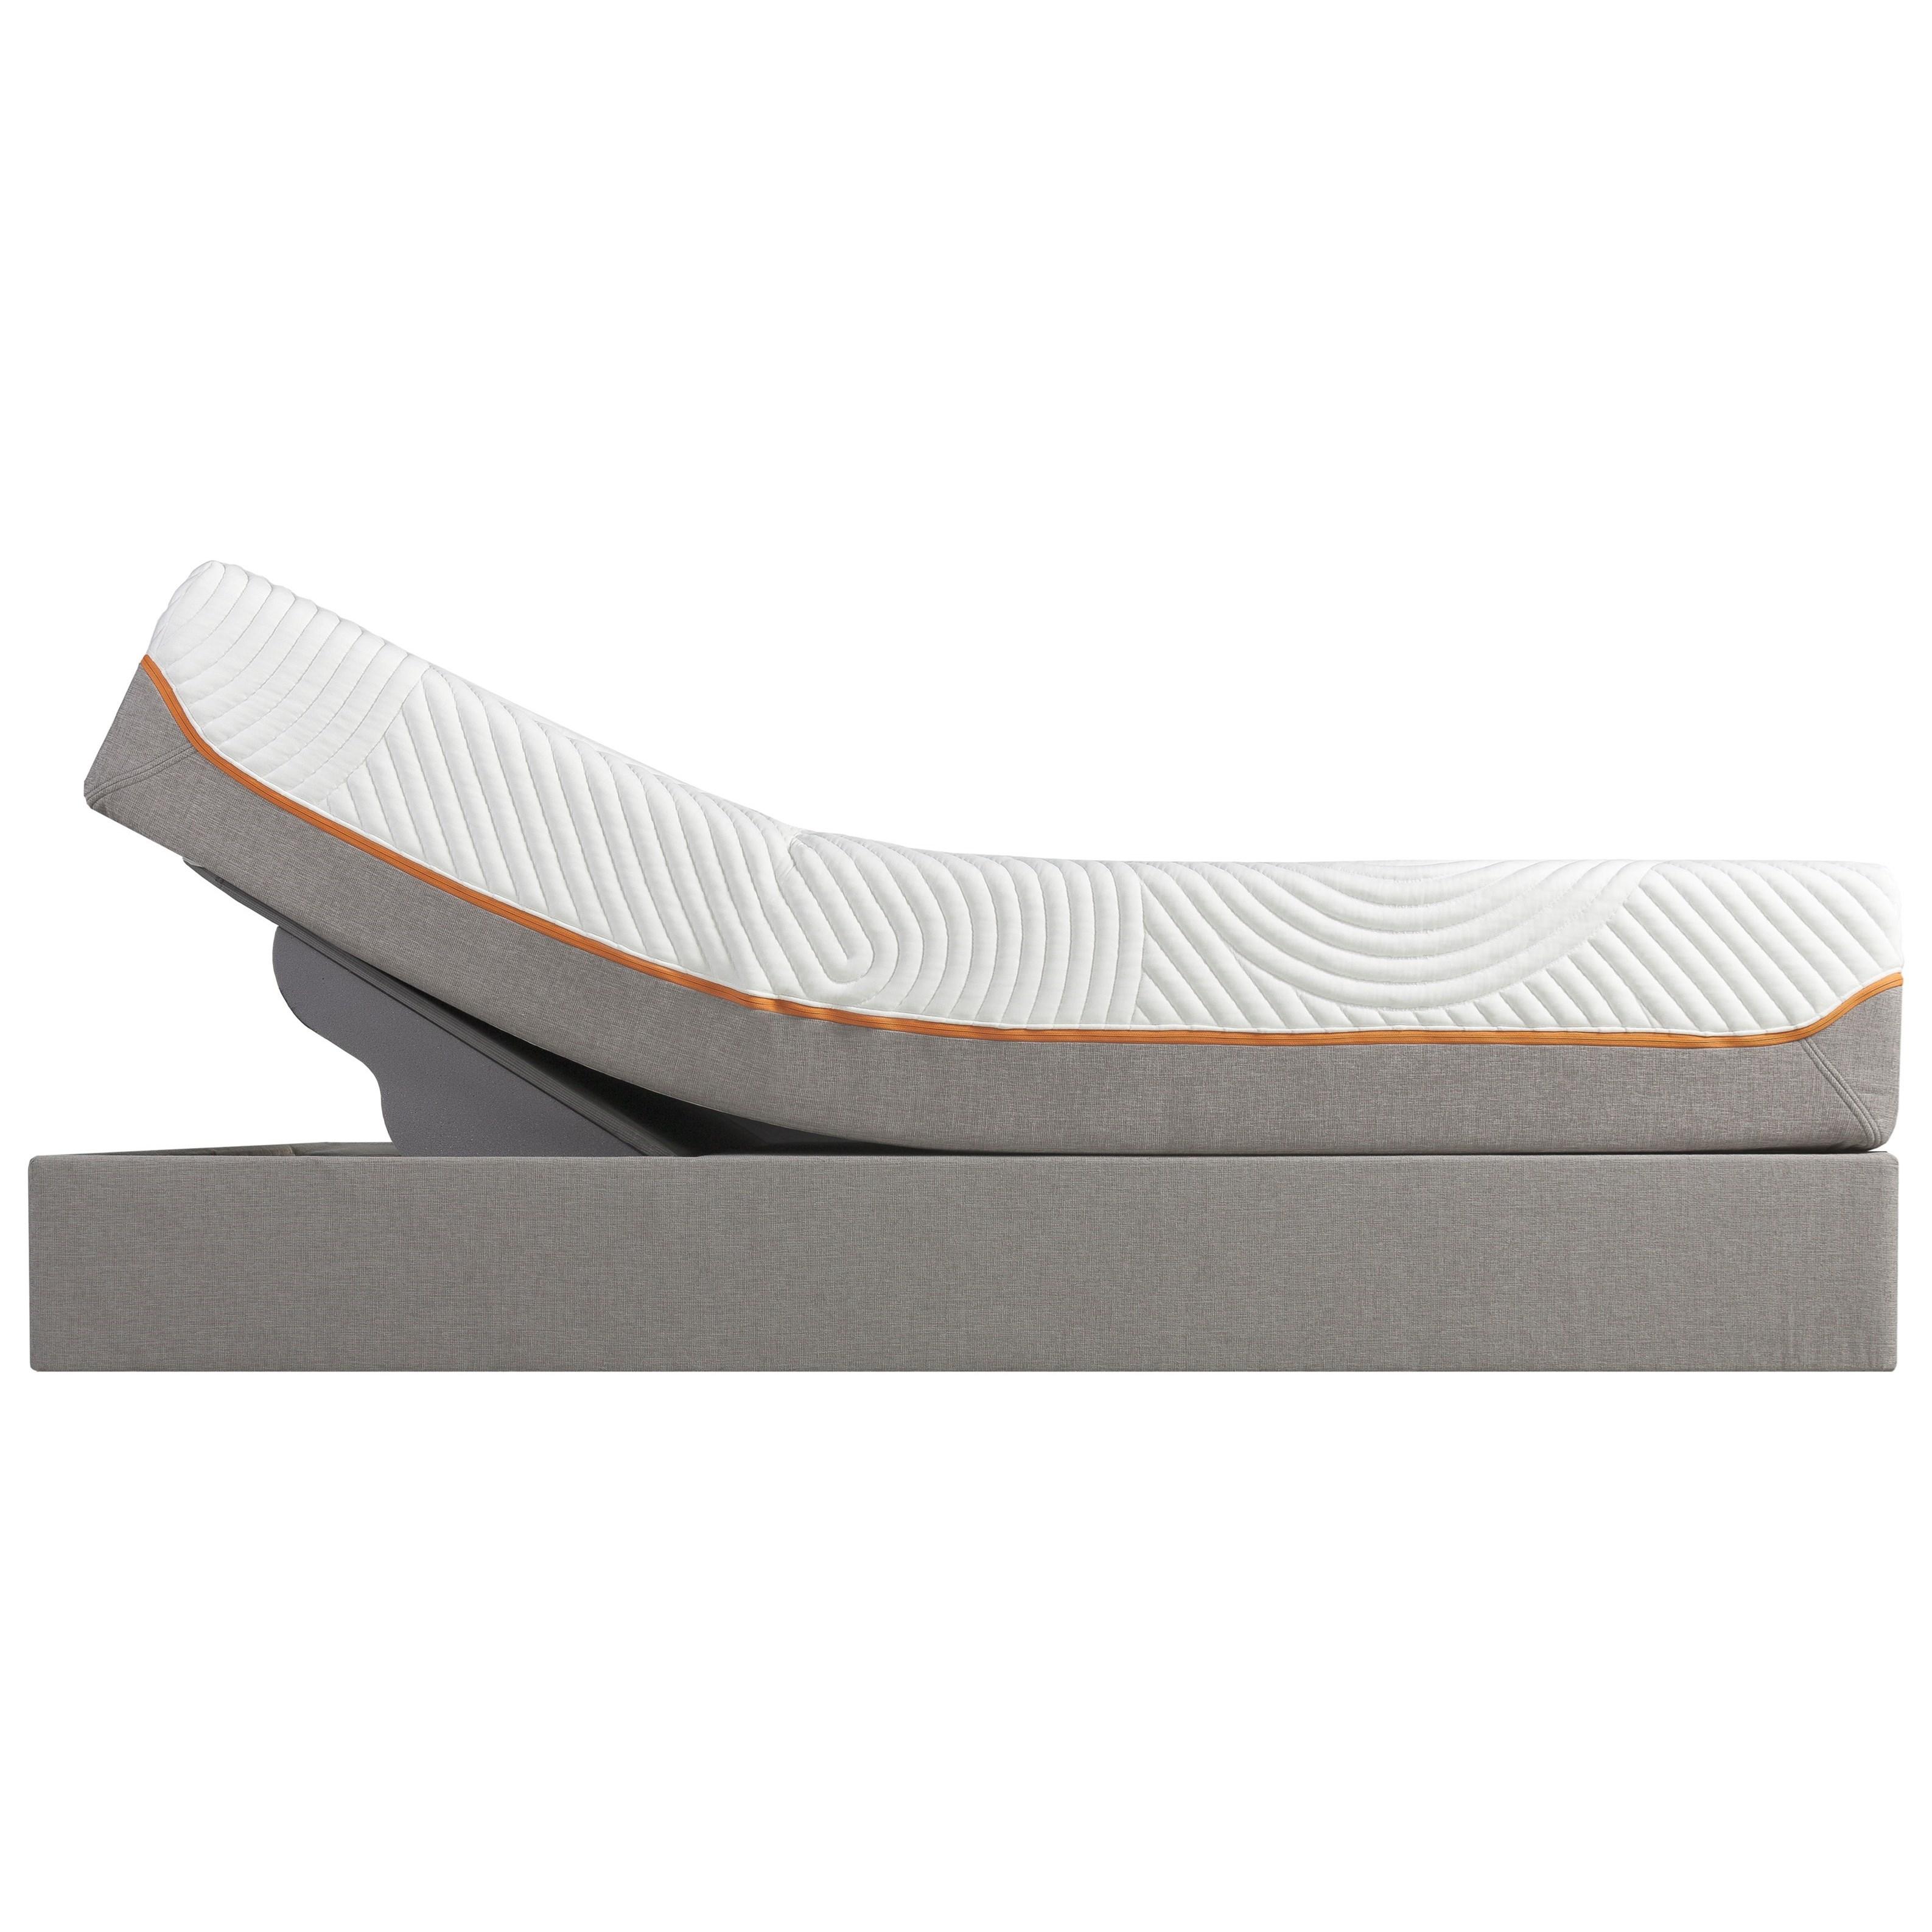 Tempur-Pedic® TEMPUR-Contour Elite Cal King Medium-Firm Mattress Set - Item Number: 10257180+2x25287190